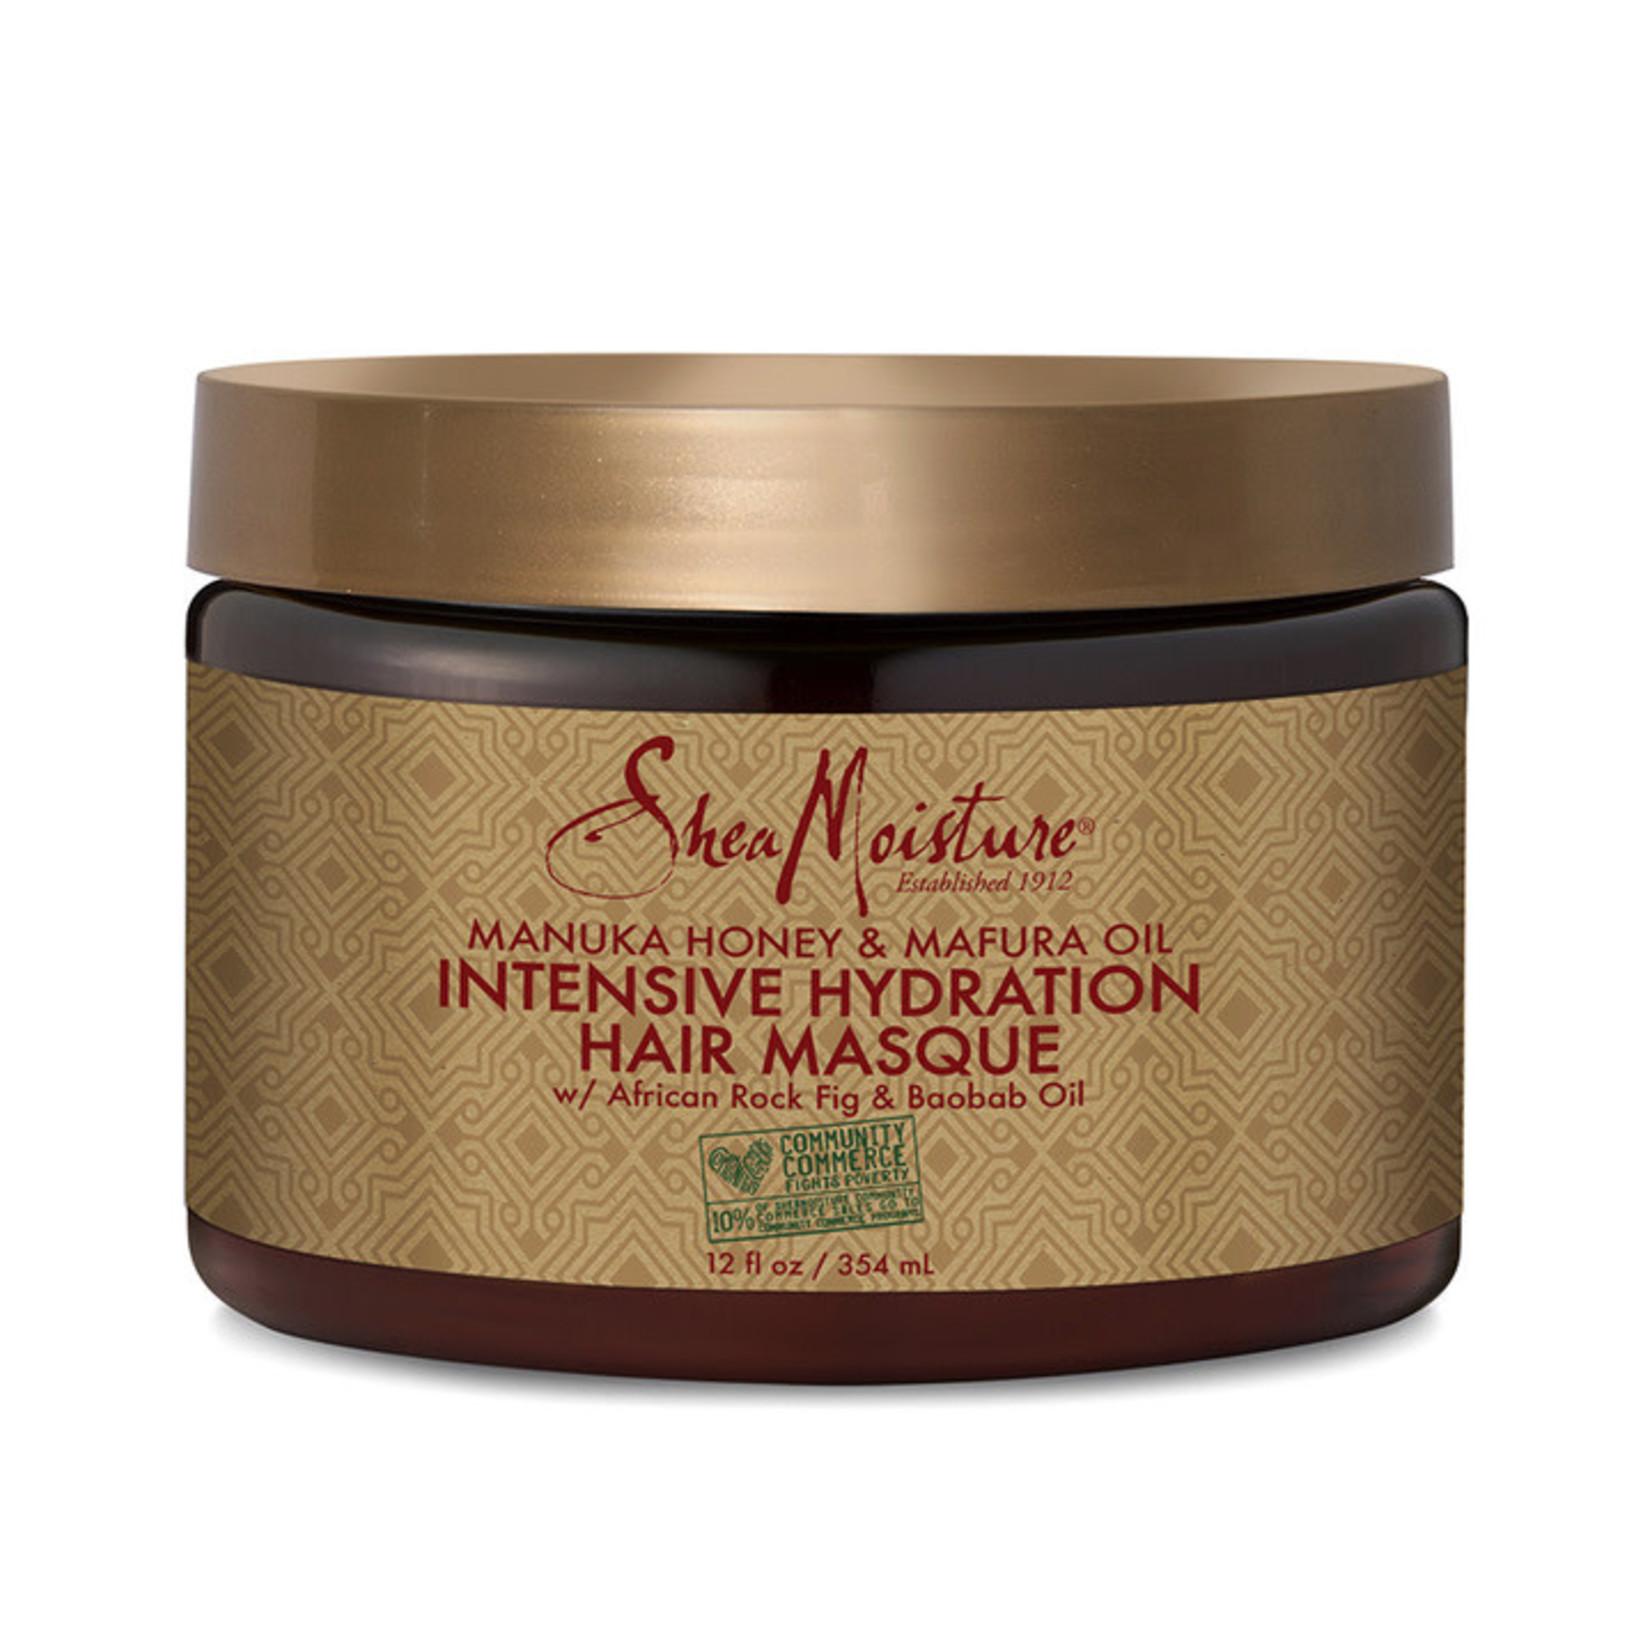 SHEA MOISTURE SHEA MOISTURE MANUKA HONEY & MAFURA OIL HYDRATION INTENSIVE HAIR MASQUE [12OZ]